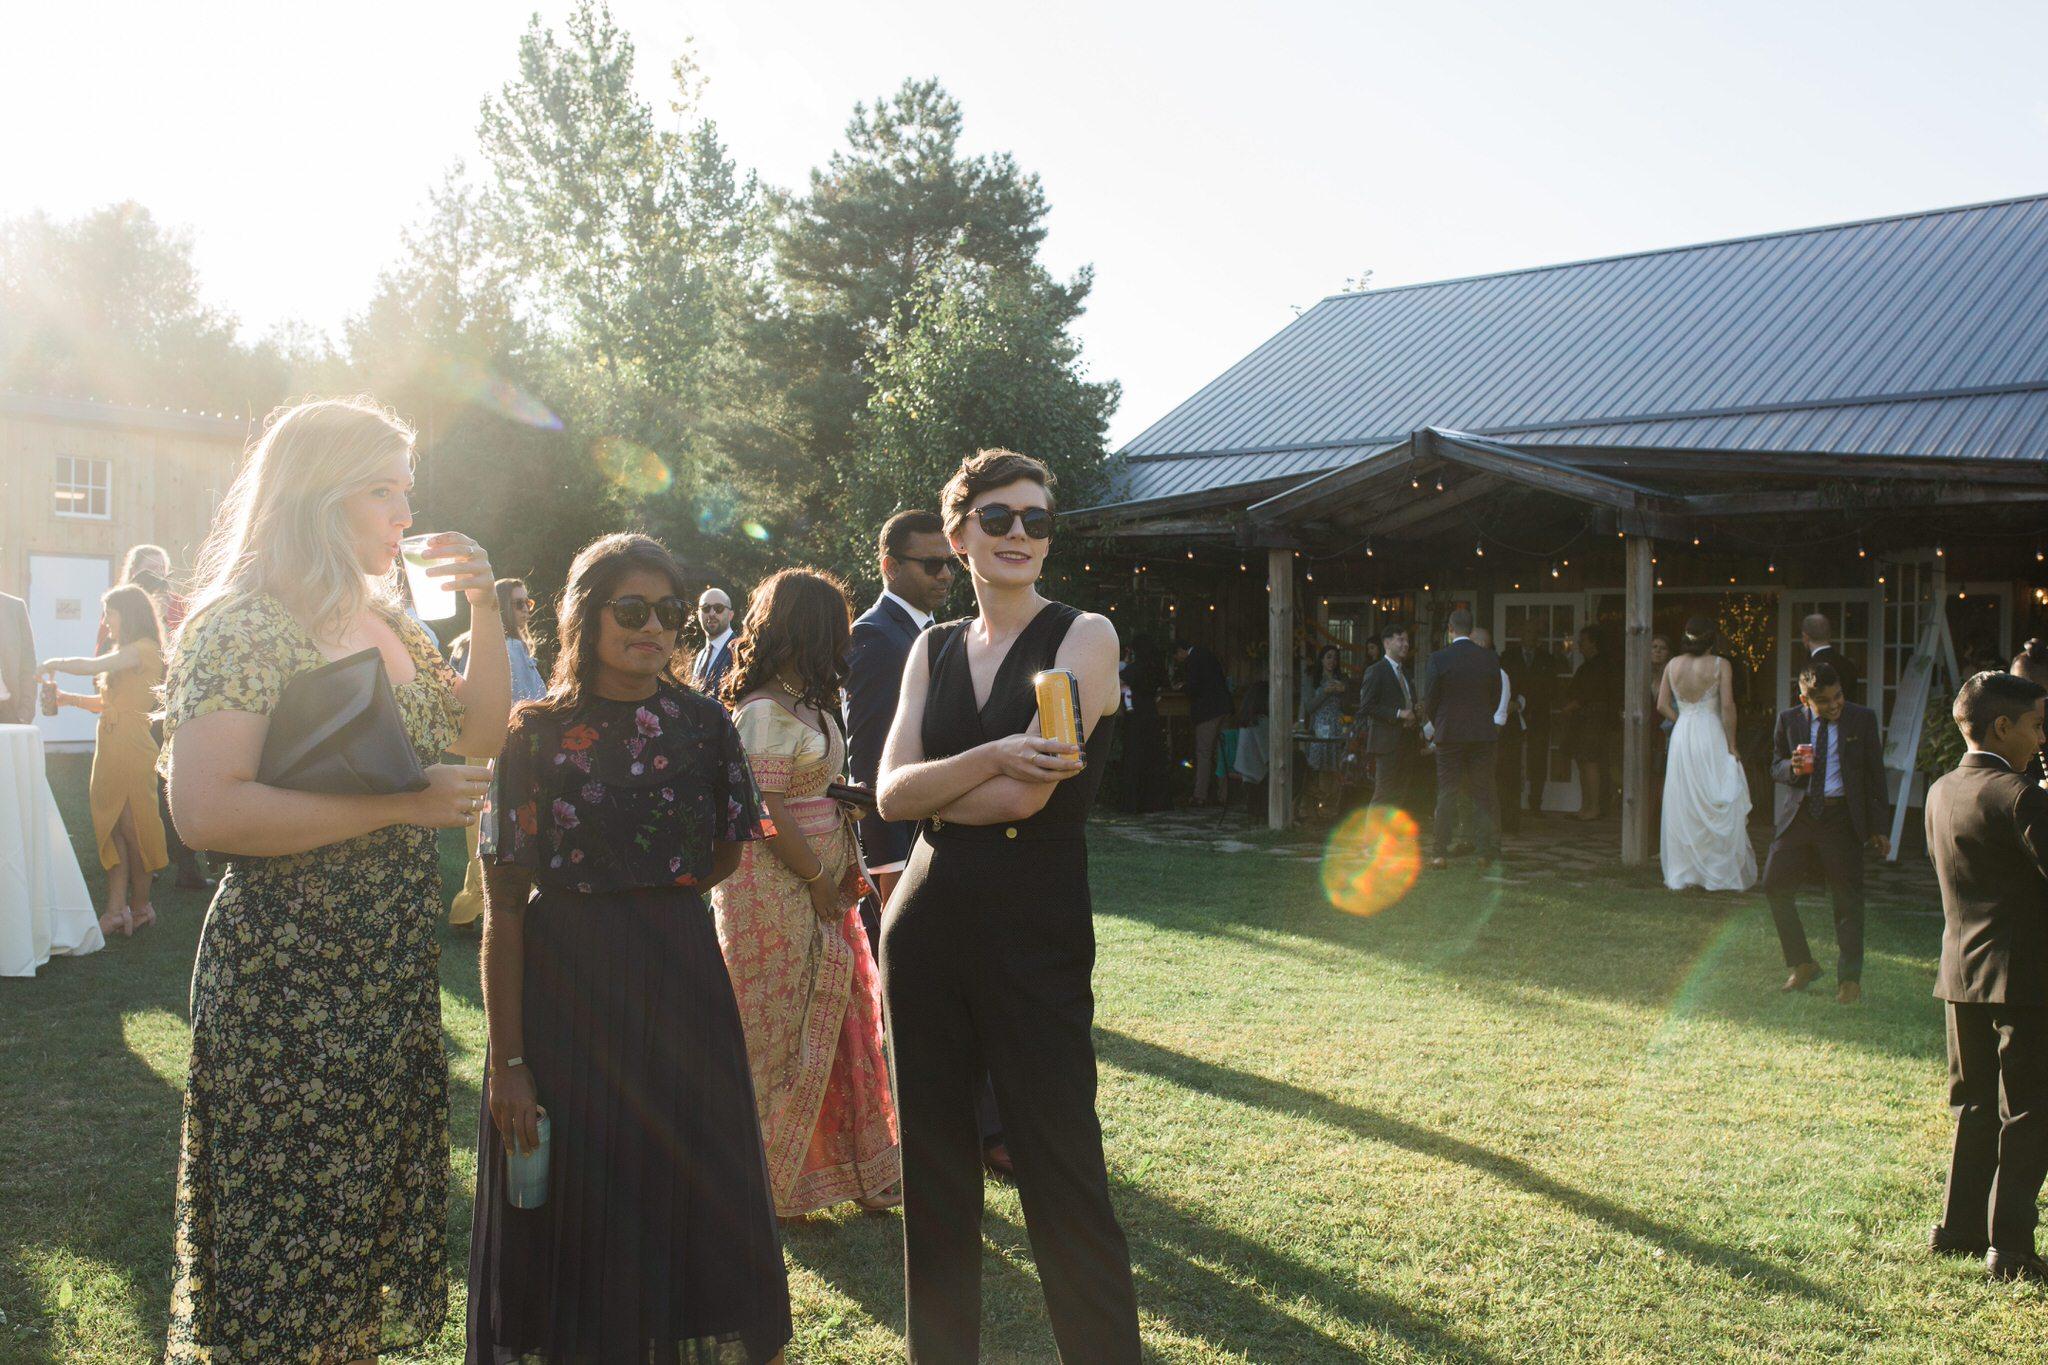 Northview Gardens Wedding - reception